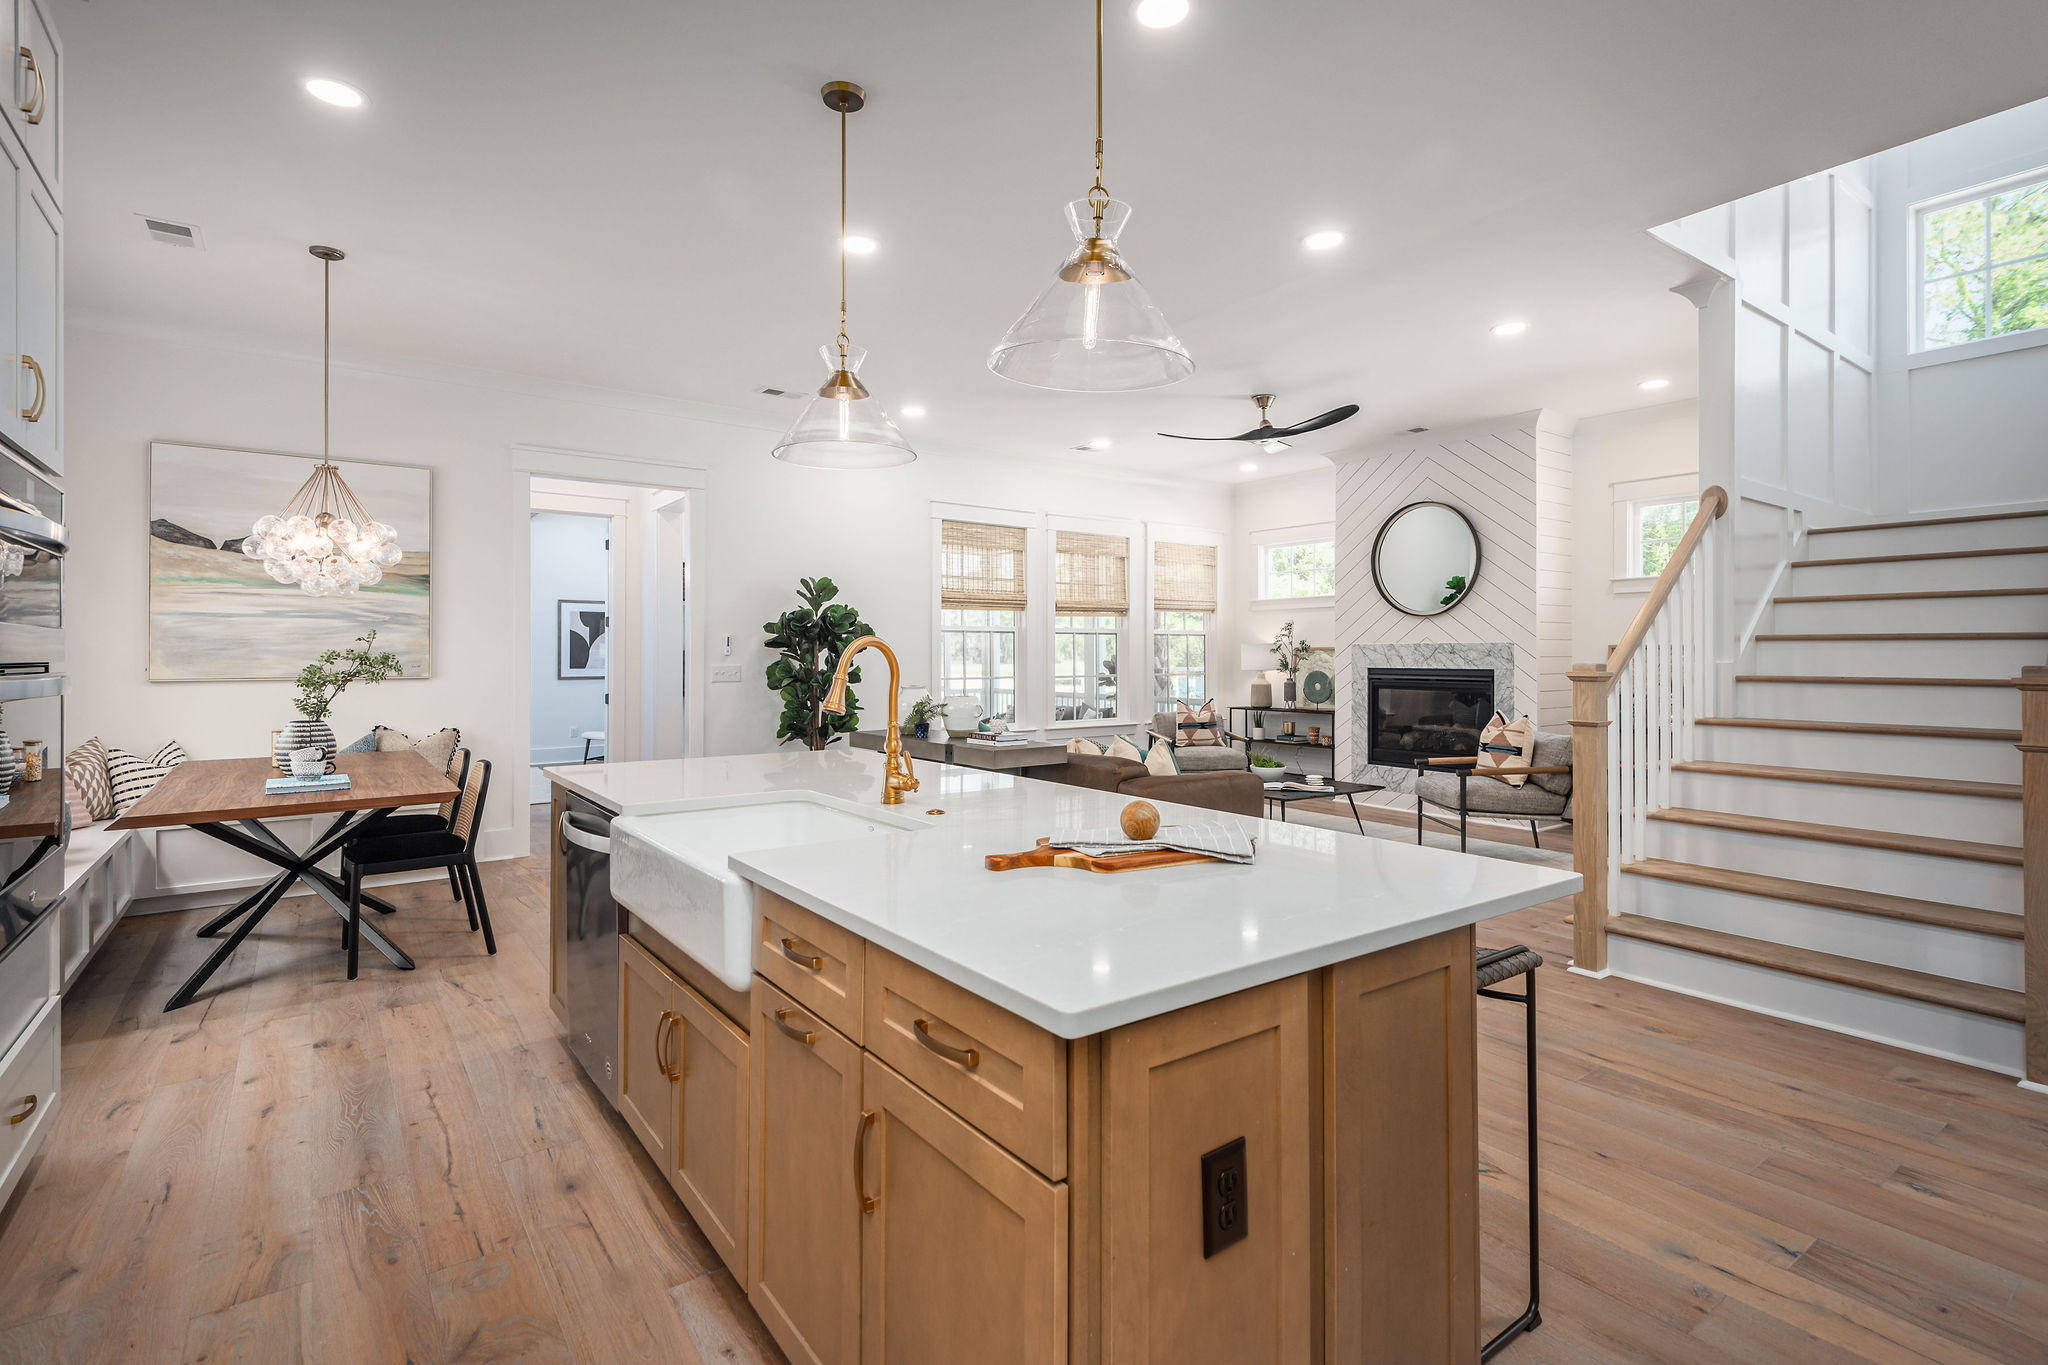 Midtown Homes For Sale - 1537 Kepley, Mount Pleasant, SC - 30